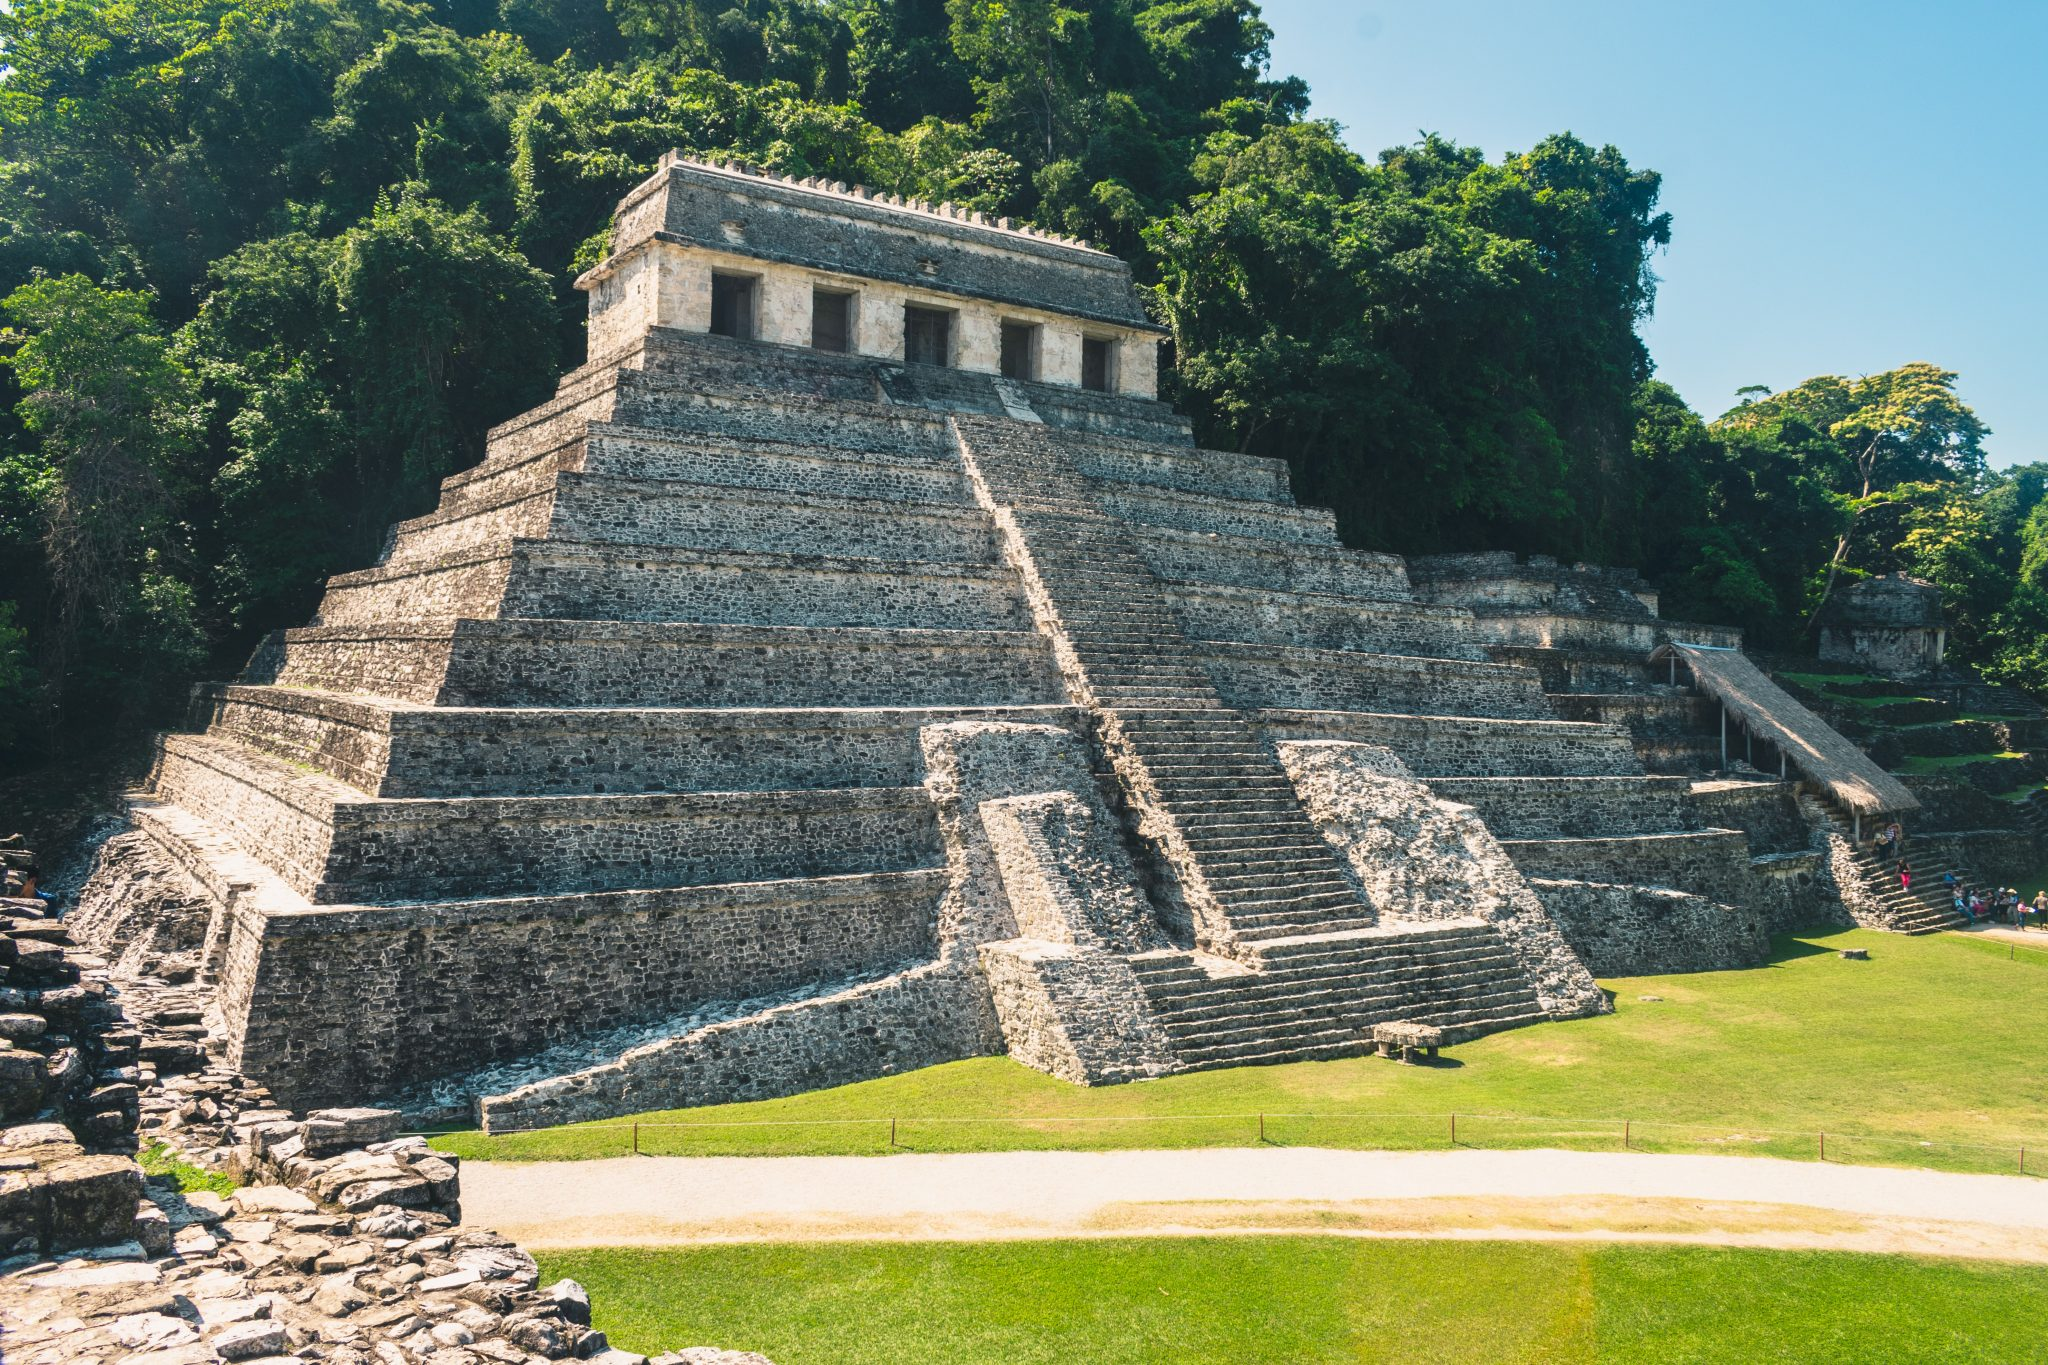 Ruiny w Palenque